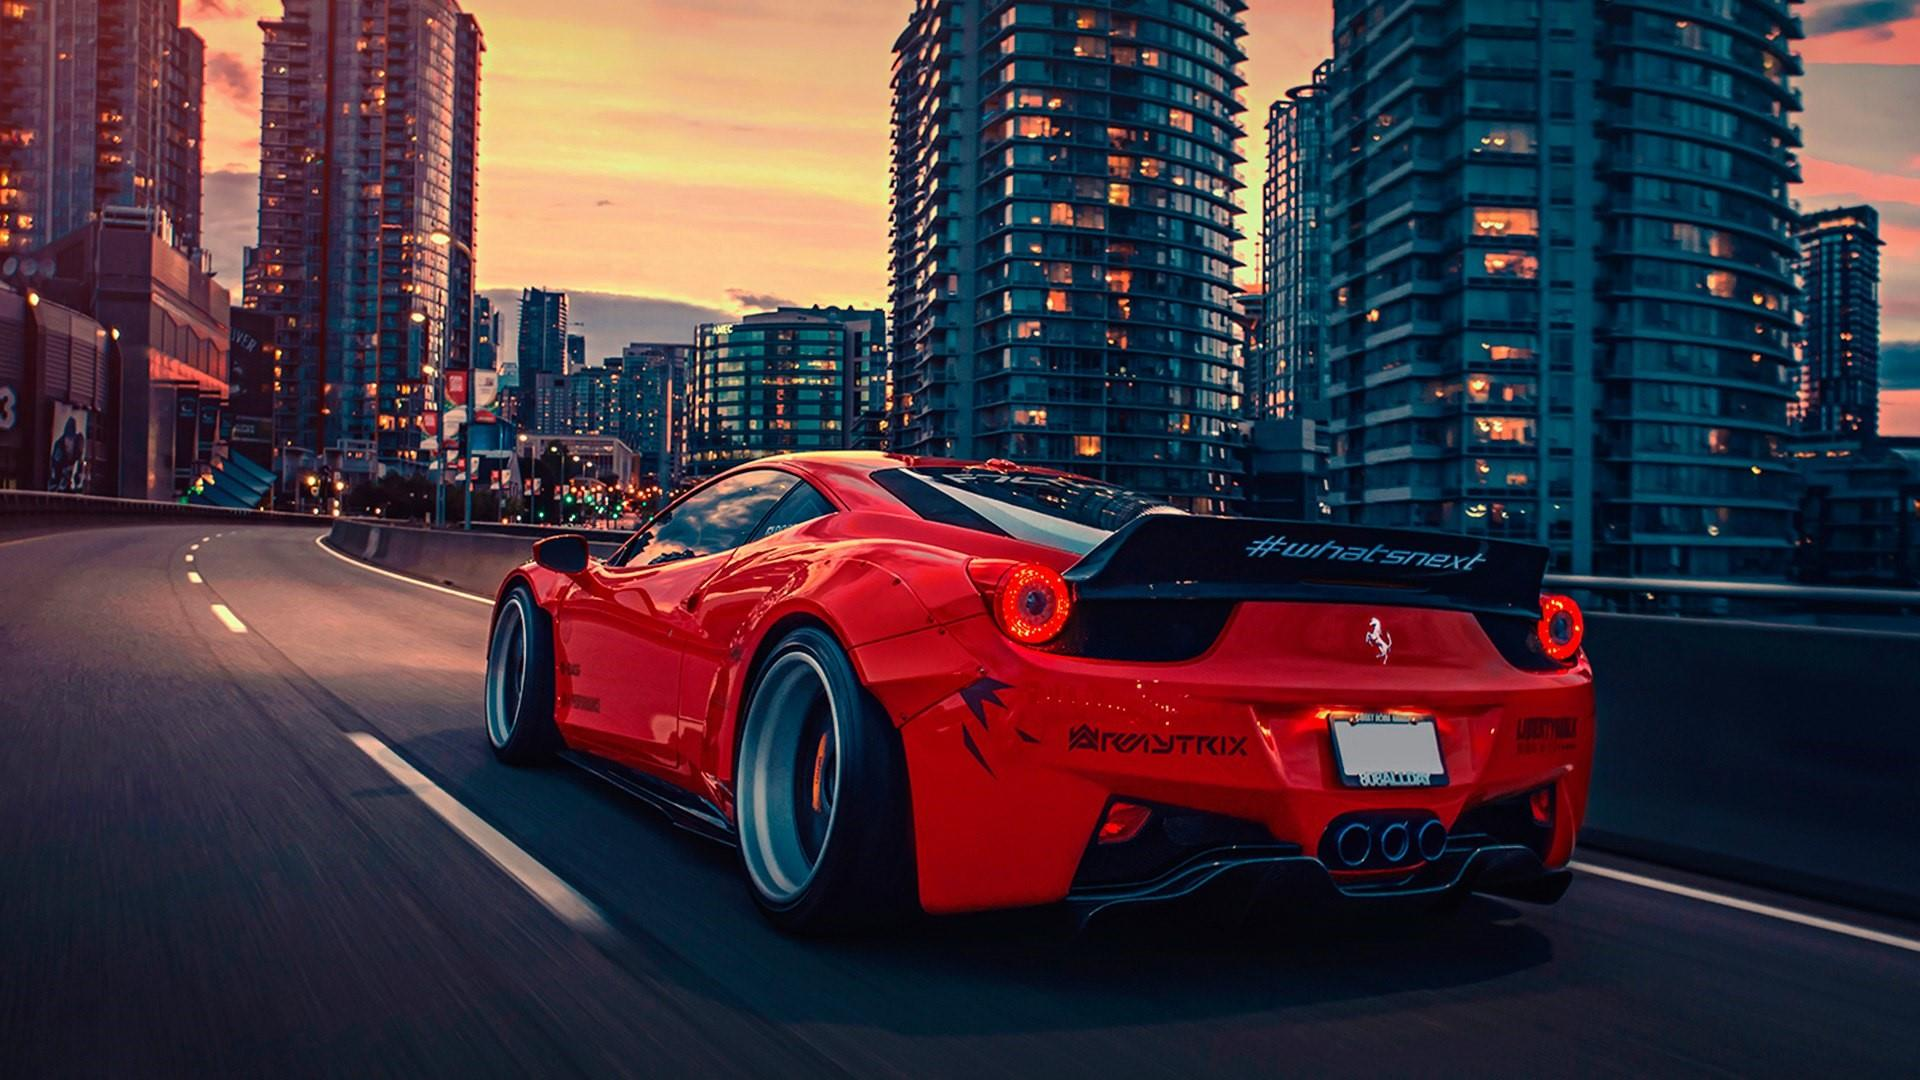 Ferrari Wallpapers Top Free Ferrari Backgrounds Wallpaperaccess